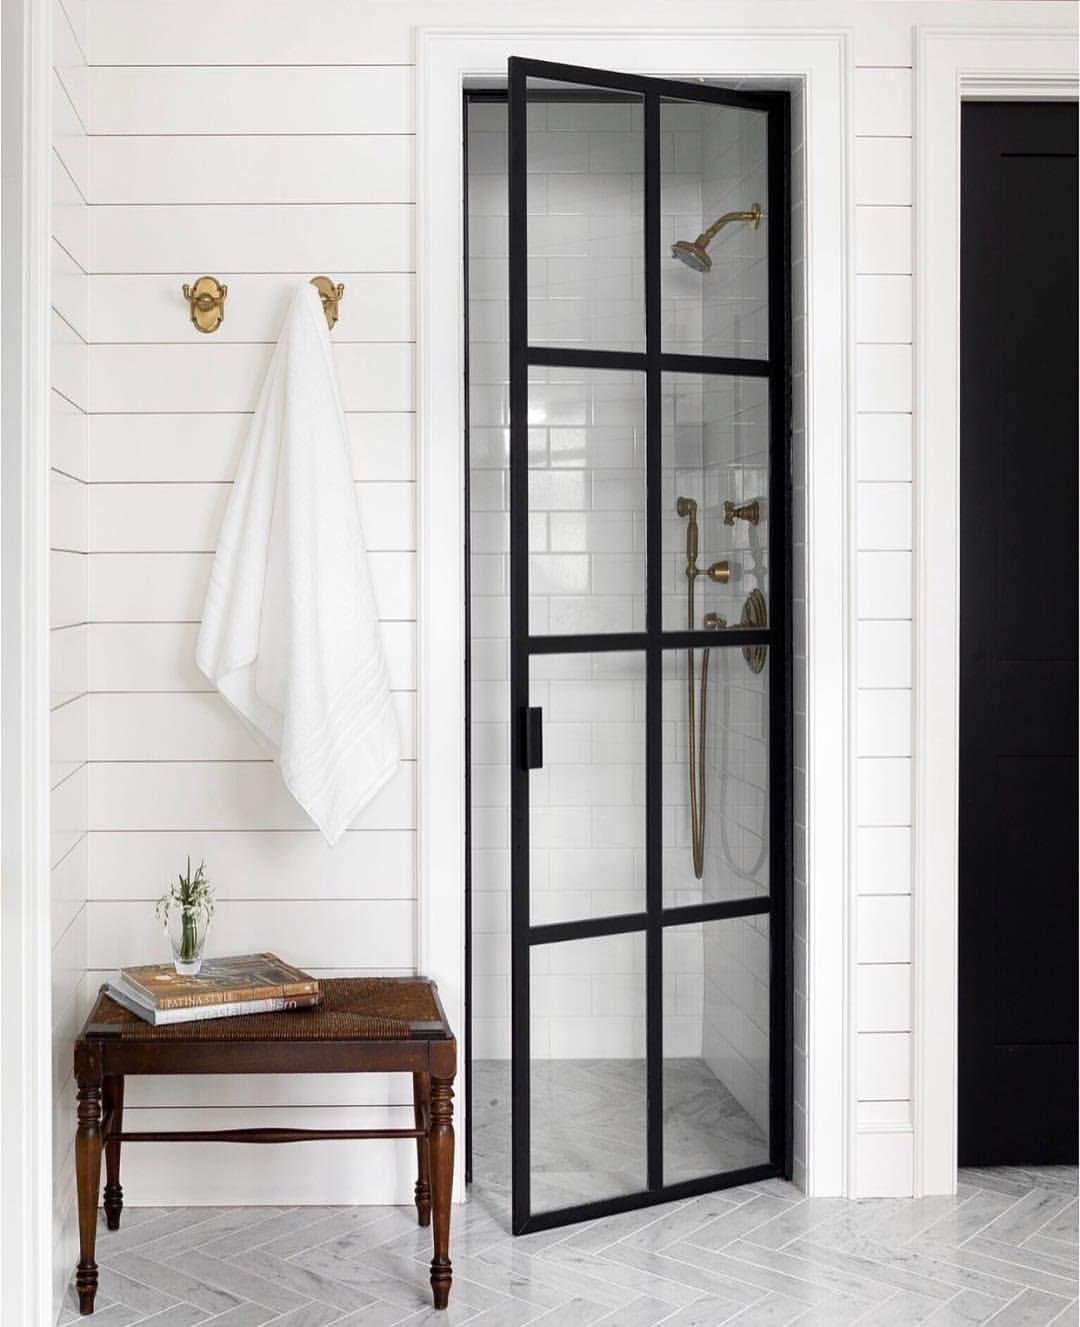 45 Best Creative Shower Doors Design Ideas For Bathroom Modern Farmhouse Bathroom Bathroom Design Framed Shower